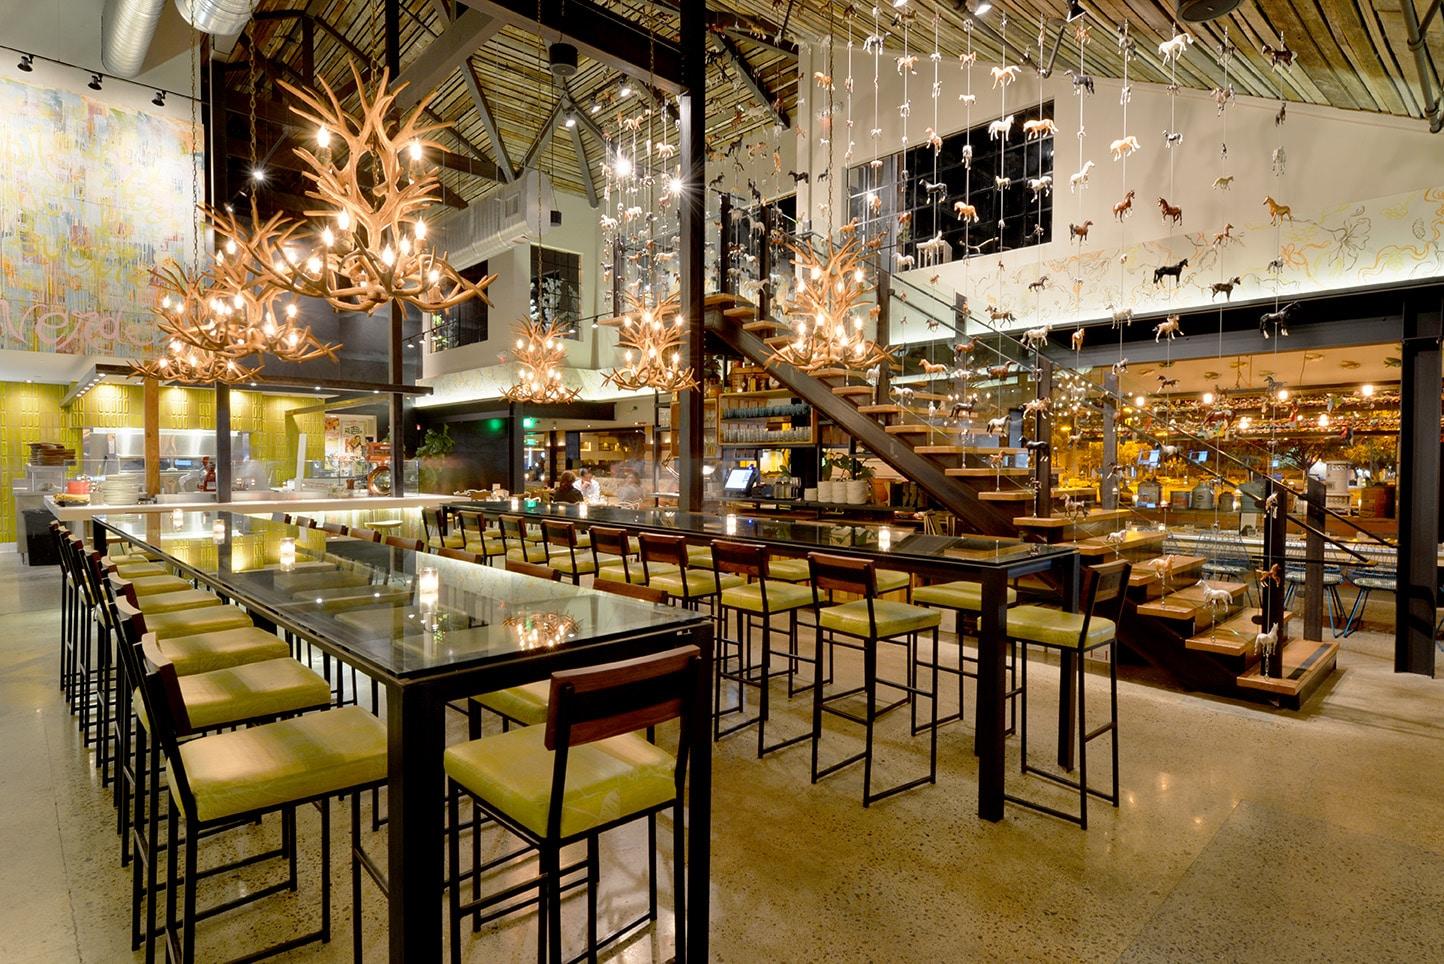 The contemporary interior of Cucina enoteca with deer antler light fixtures an industrial decor.